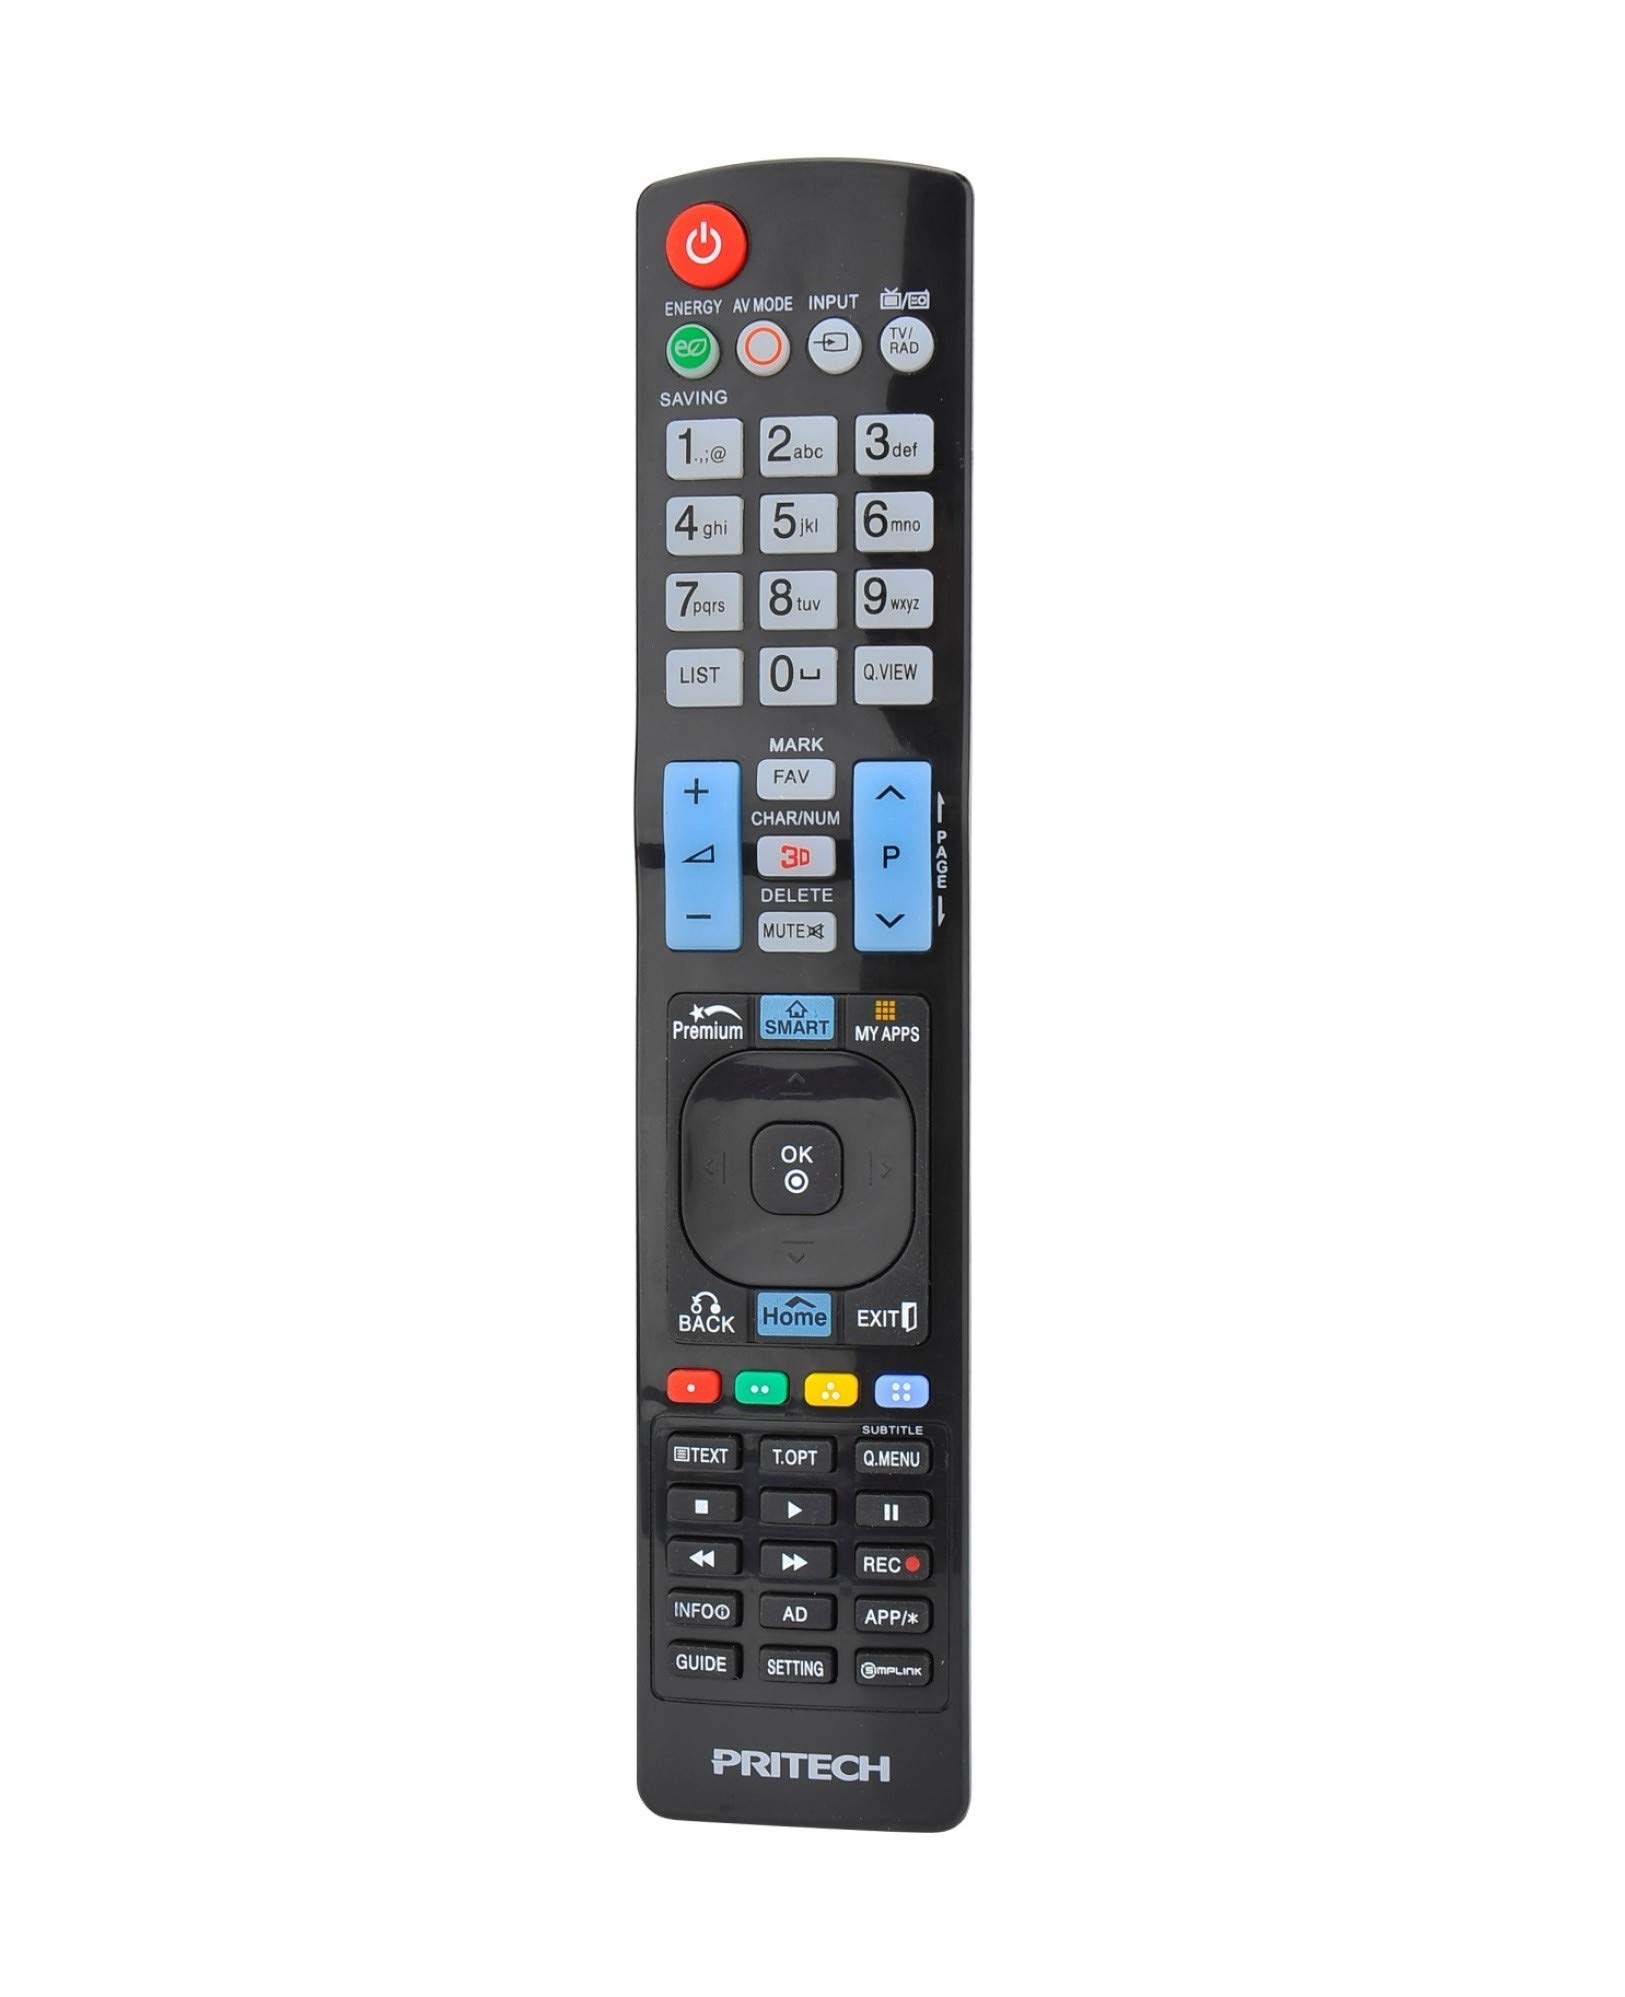 Pritech - Mando a Distancia Universal para Televisores: Amazon.es: Electrónica